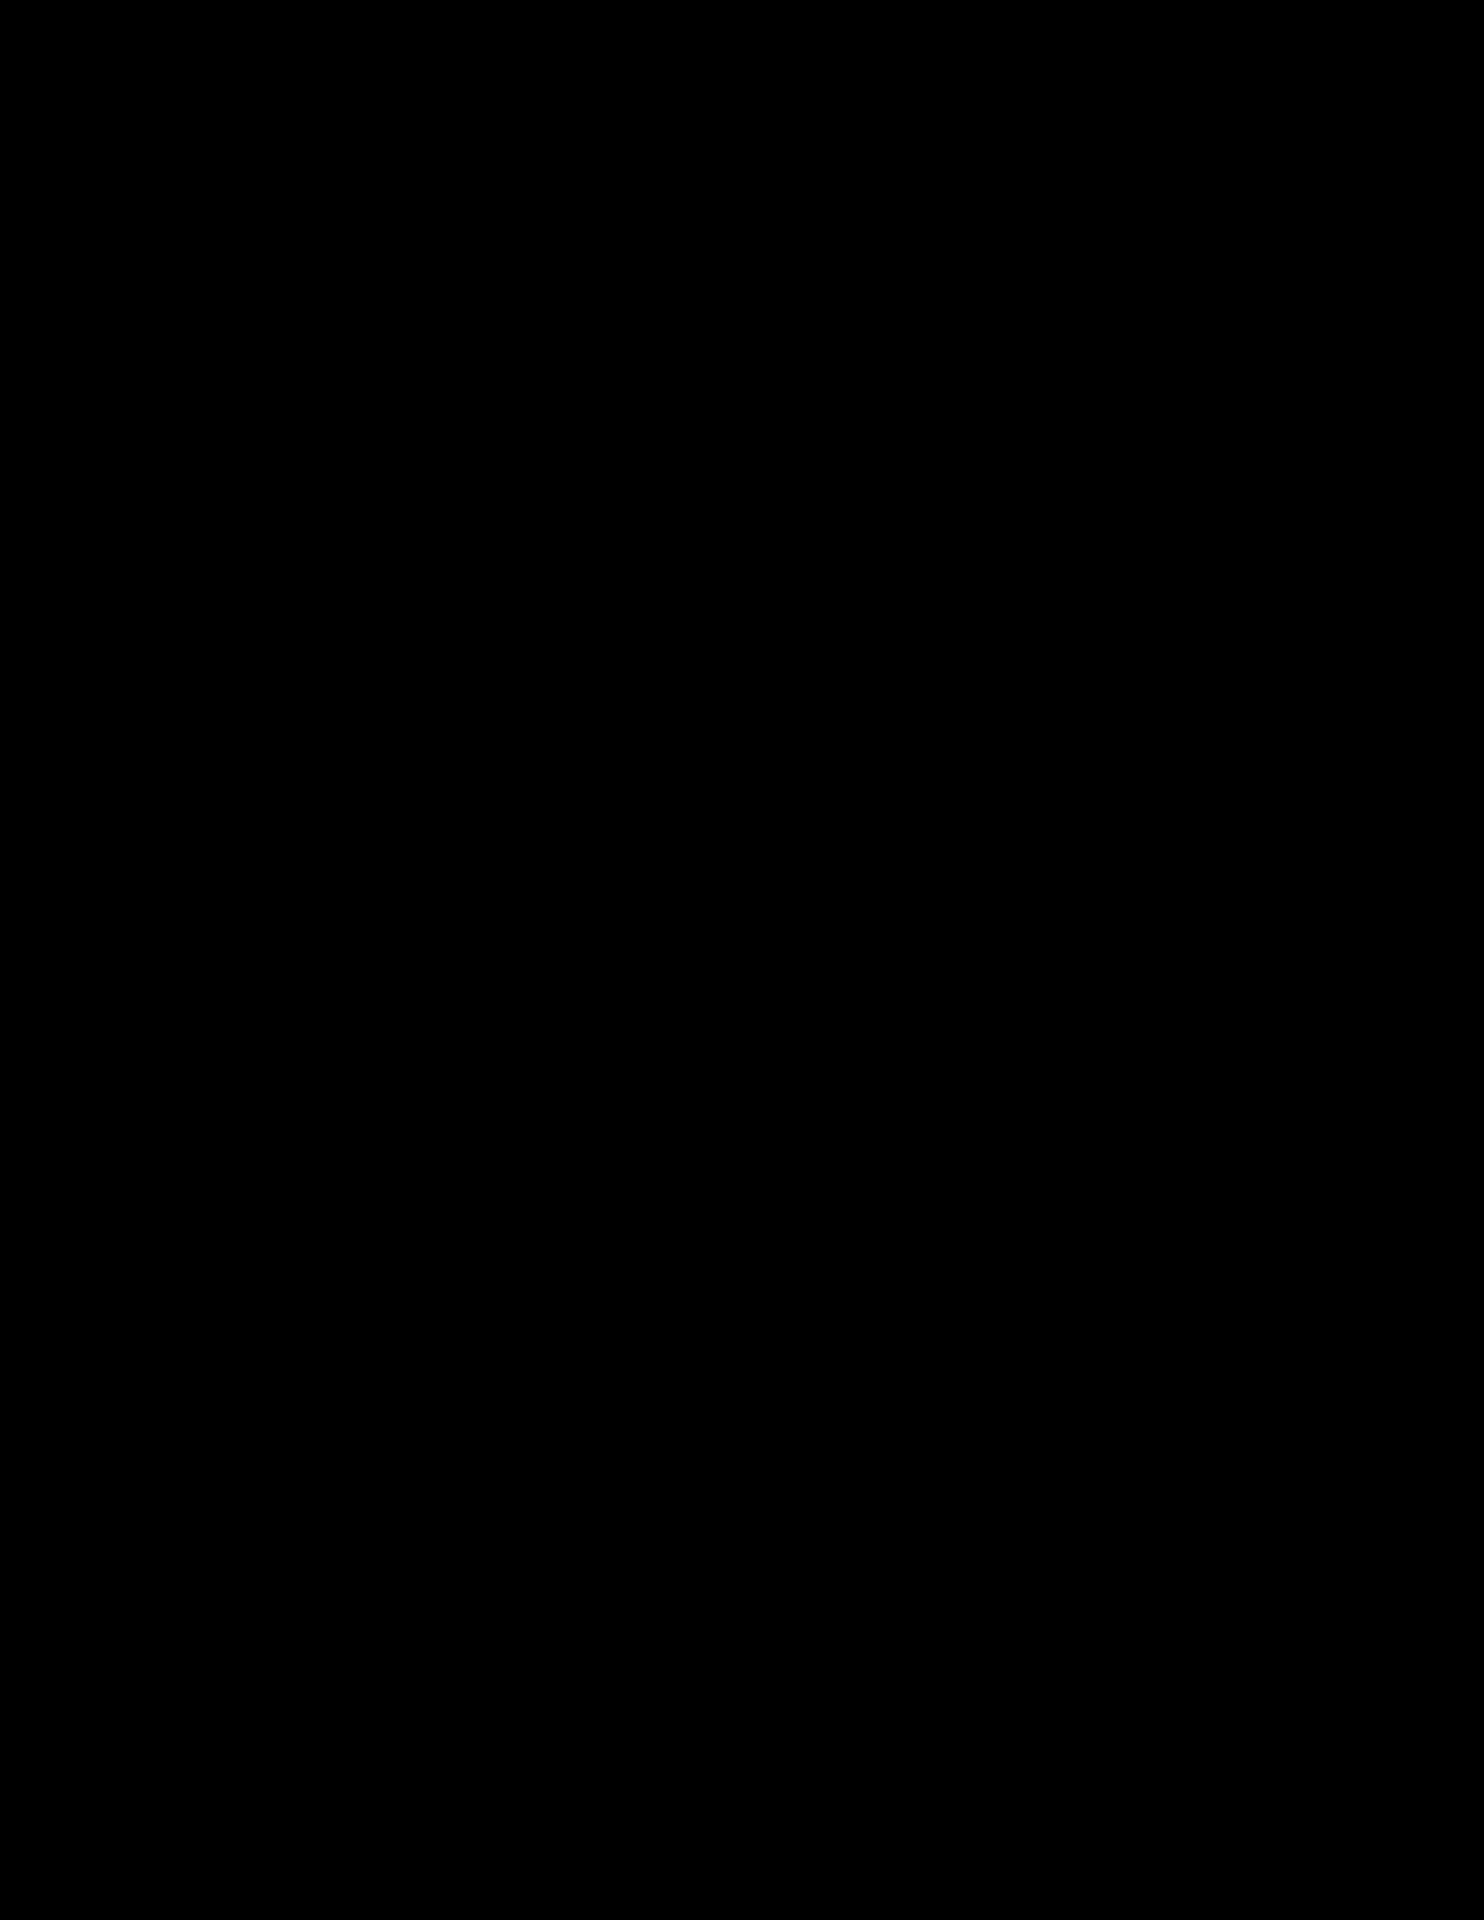 F3BECC33-68A2-4E0A-8F8B-9EF3B23B9500